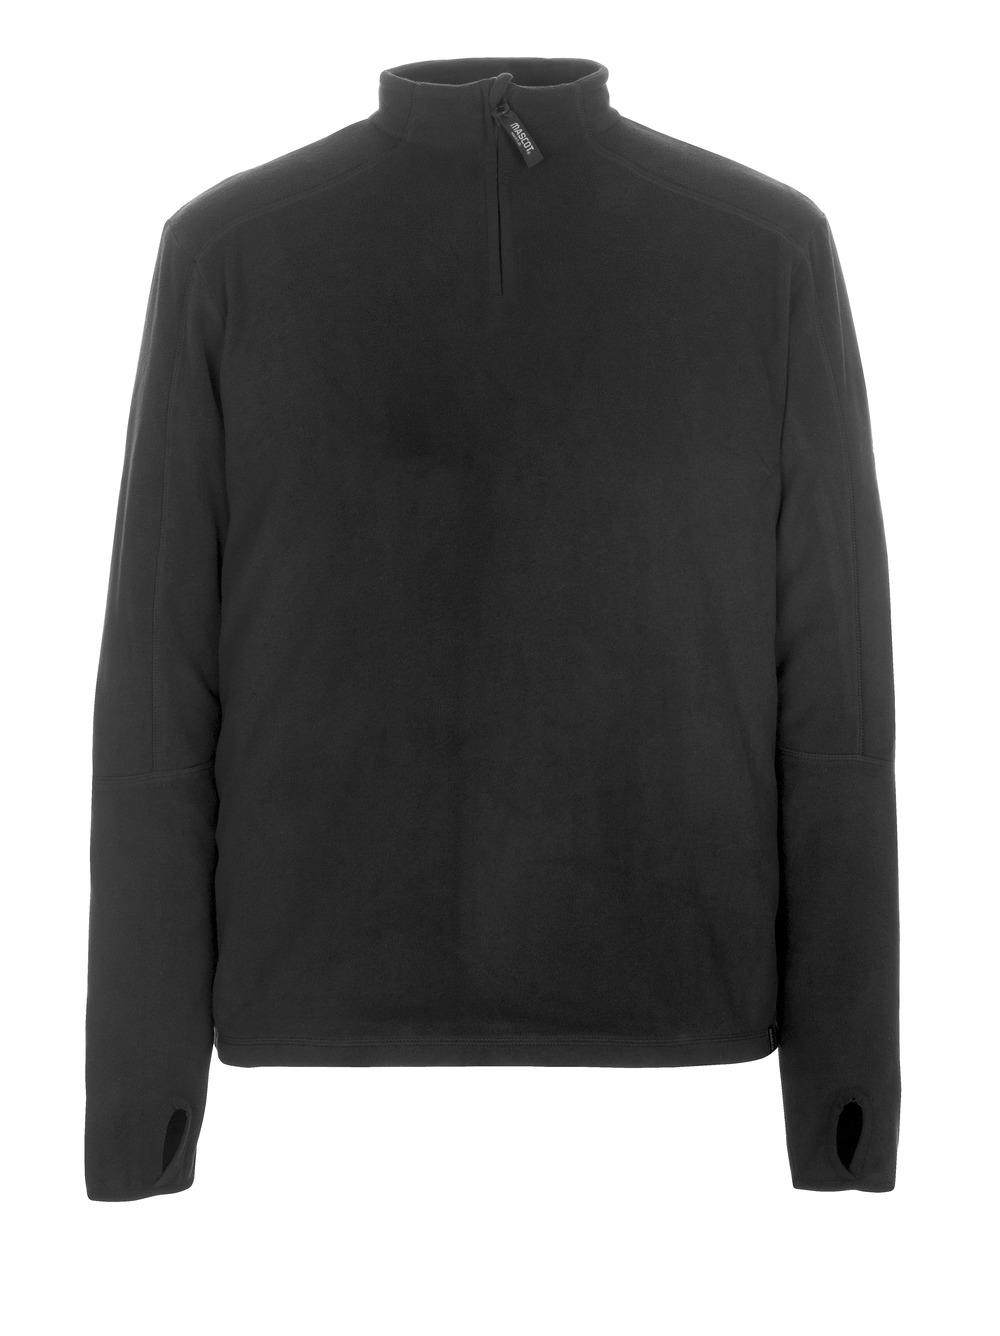 50531-923-09 Fleecetrøje med kort lynlås - sort